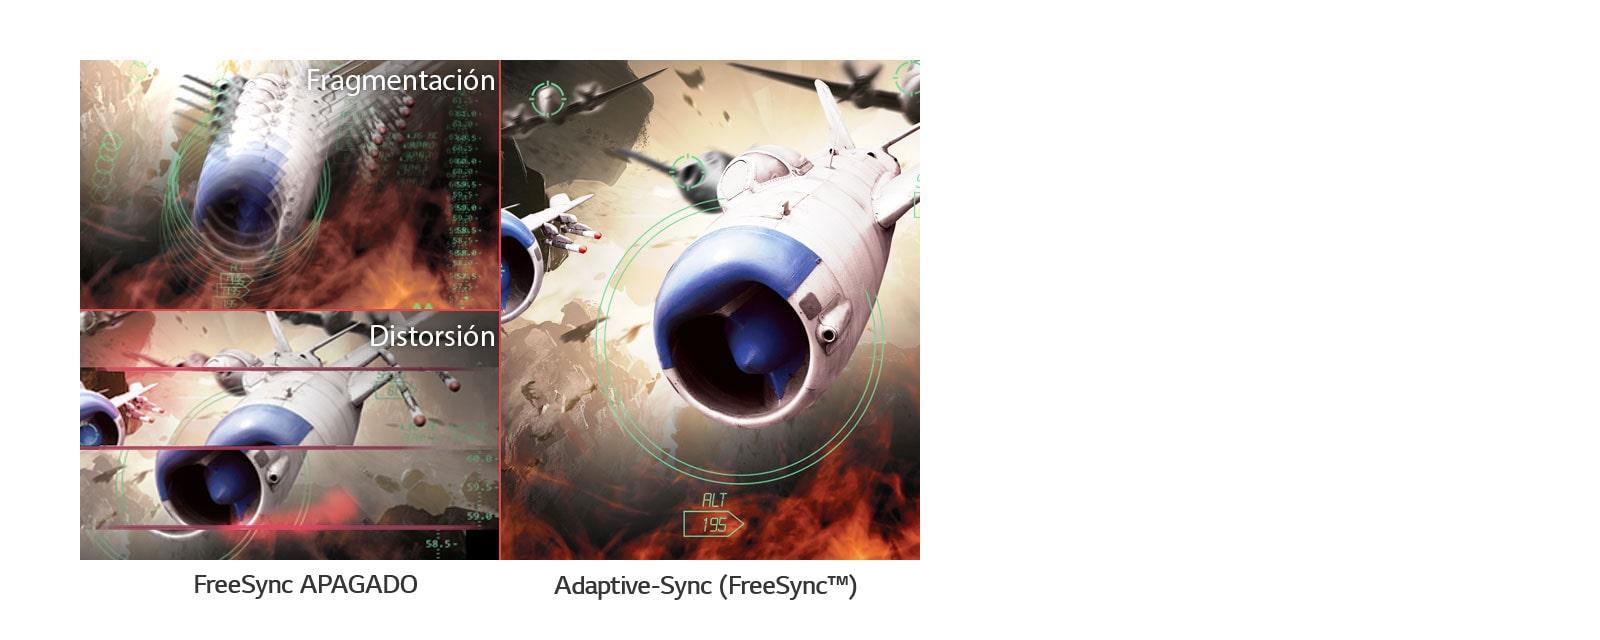 Adaptive-Sync (FreeSync™)1